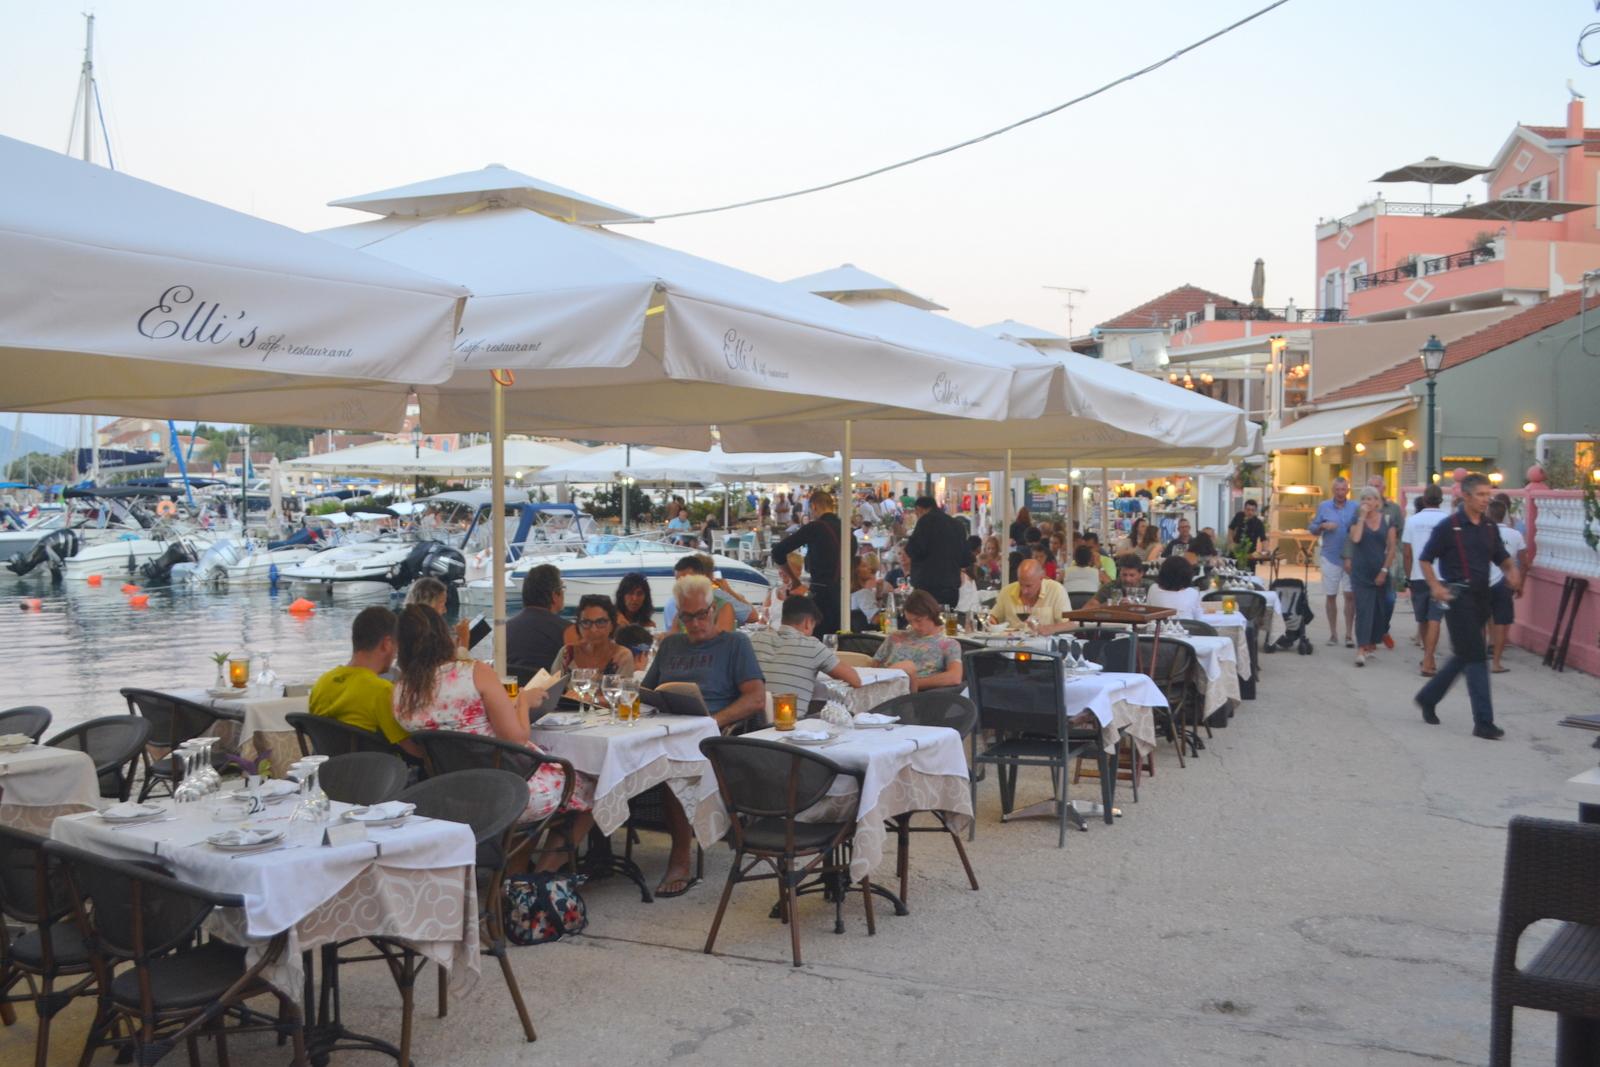 Elli's Restaurant - Fiskardo